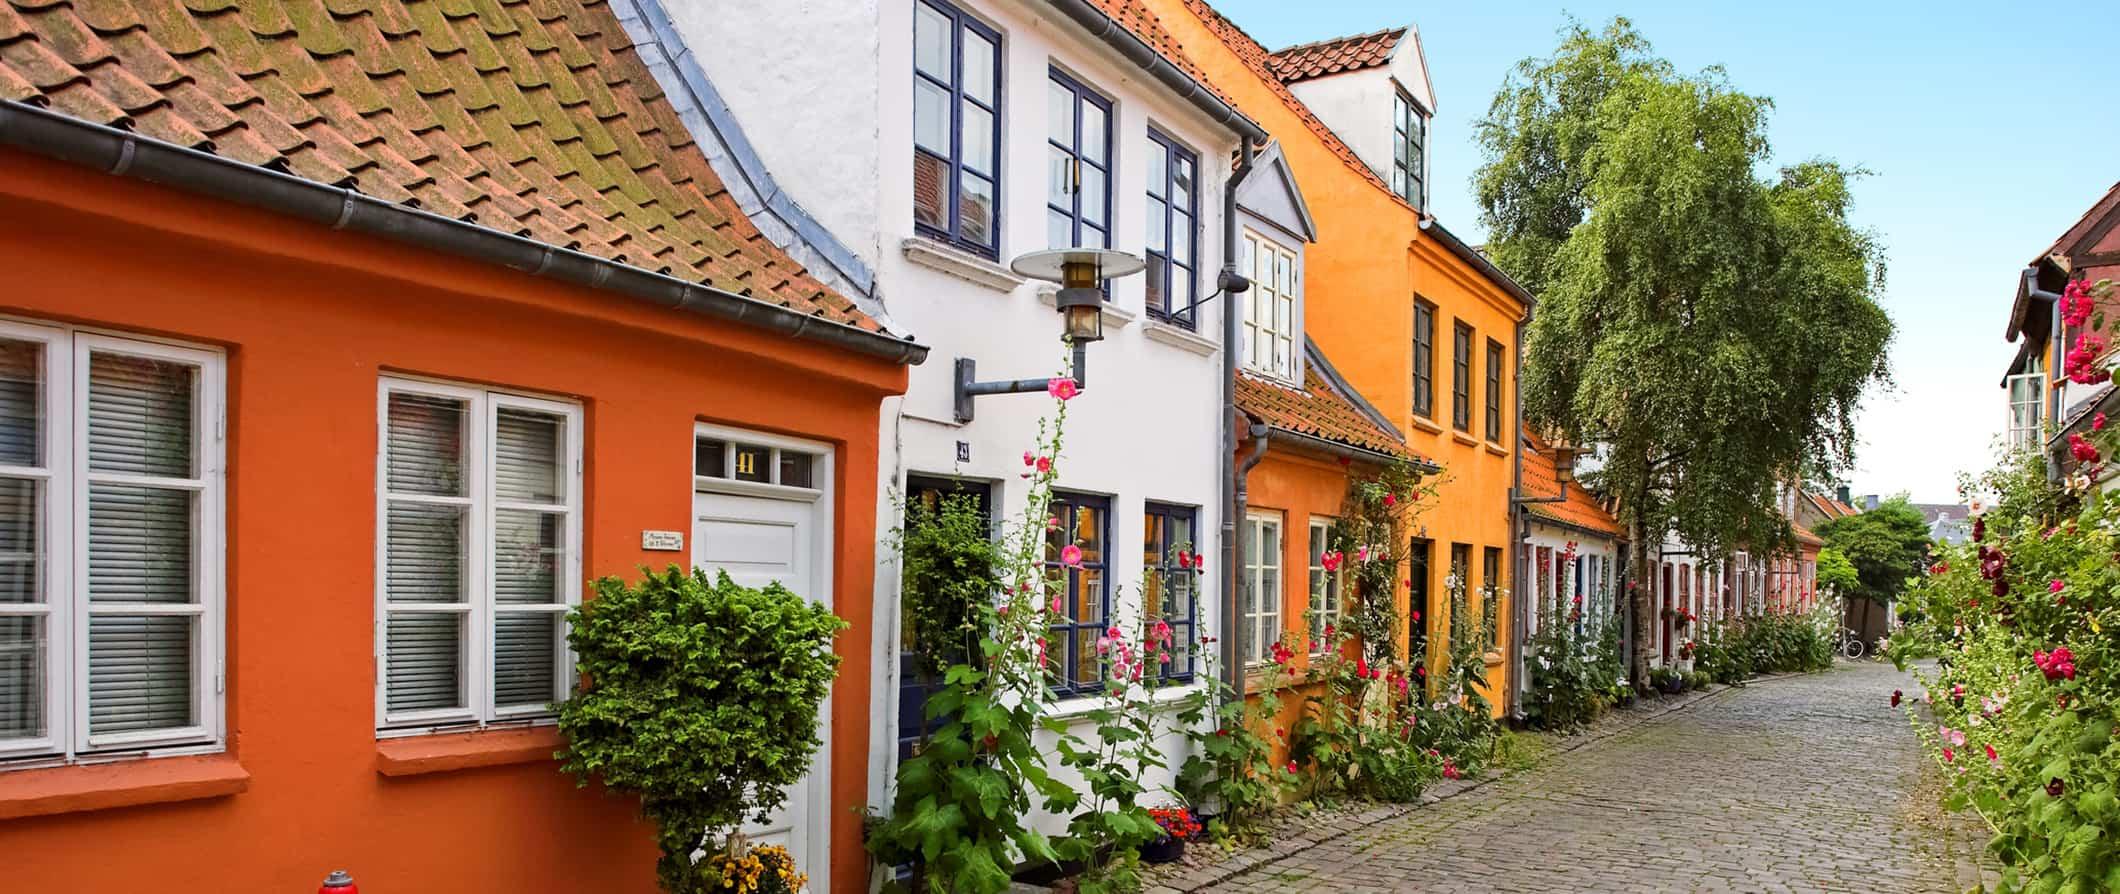 colorful homes in arhus, denmark